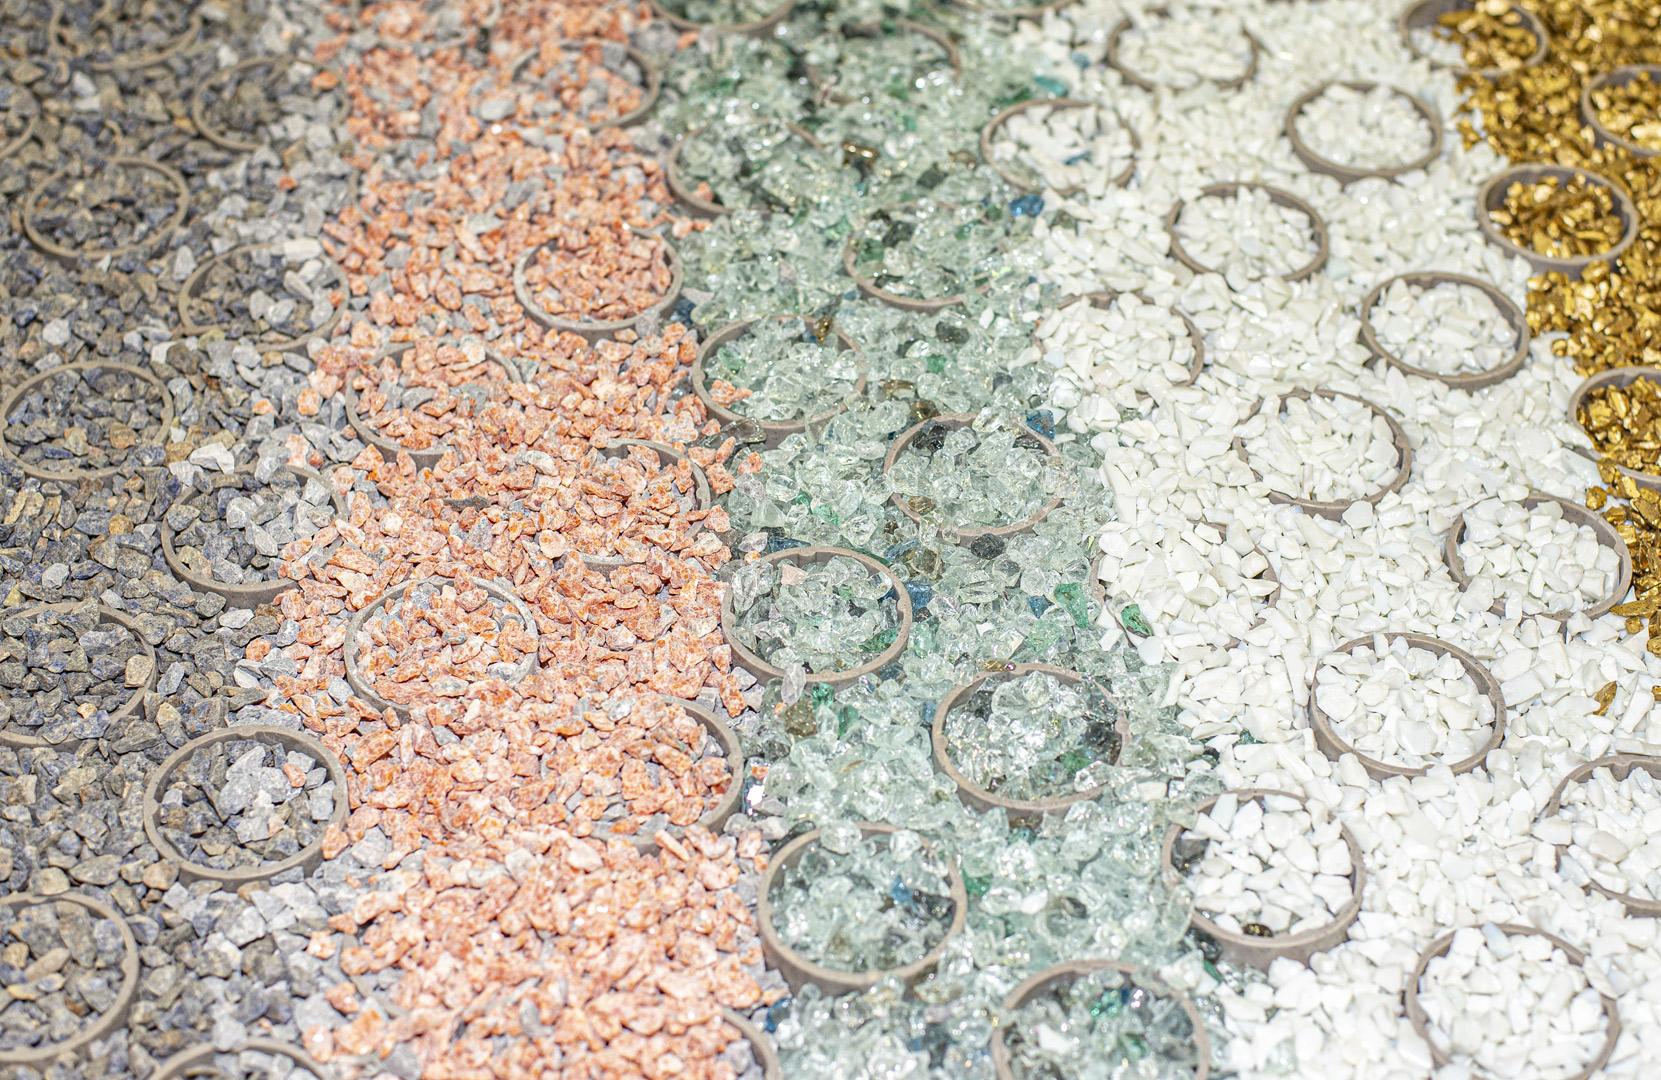 Gravelpave2 Porous Gravel Paving Gravel Paving Products